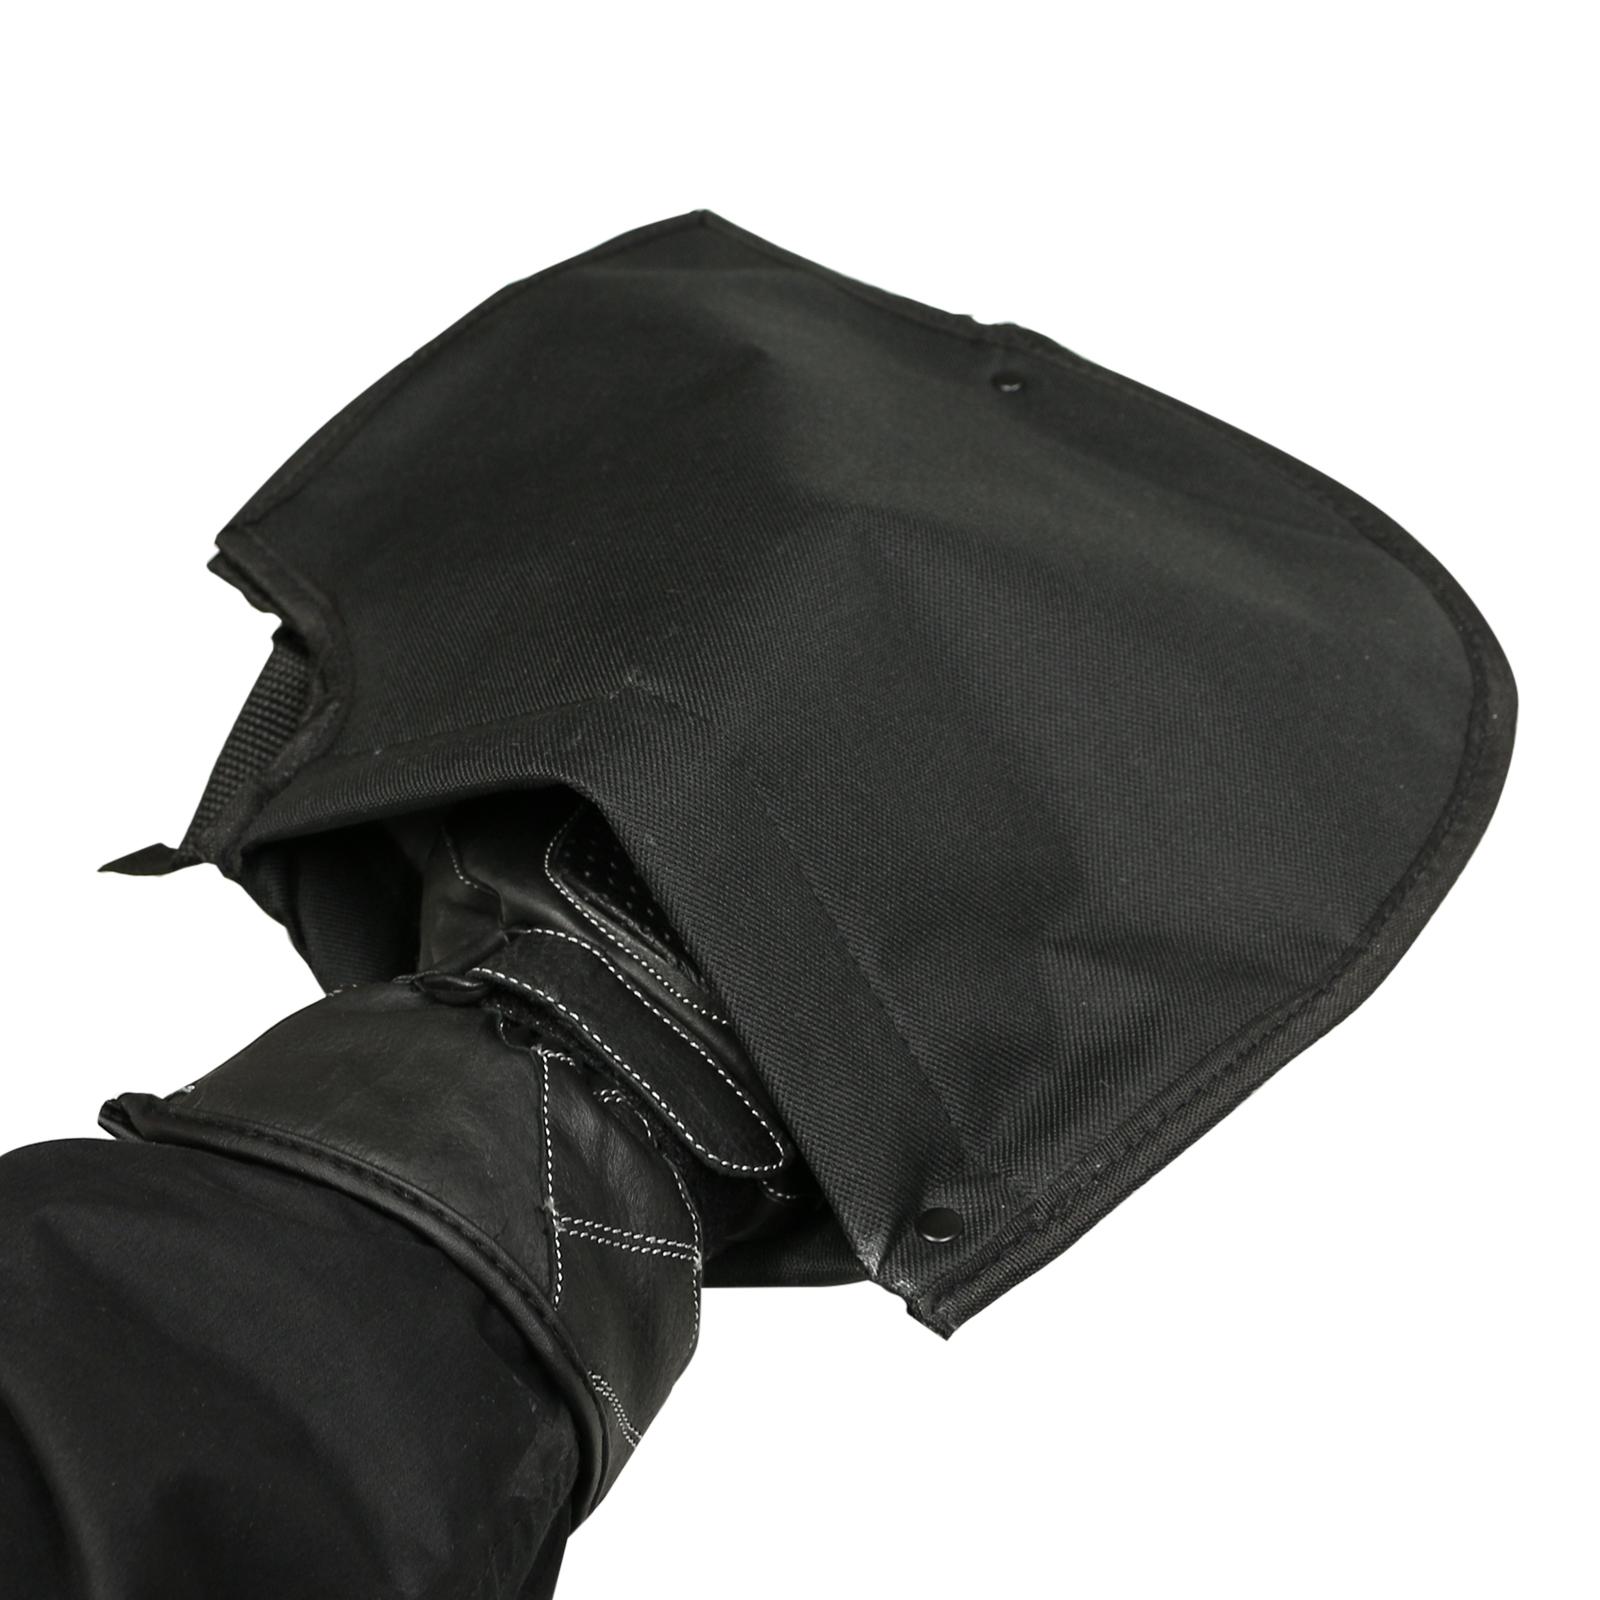 5fefd24aec3388 Sentinel Ryde Motorrad Stulpen/Handschuhe mit Thermofleece-Fütterung -  Wasserfest- 1 Paar